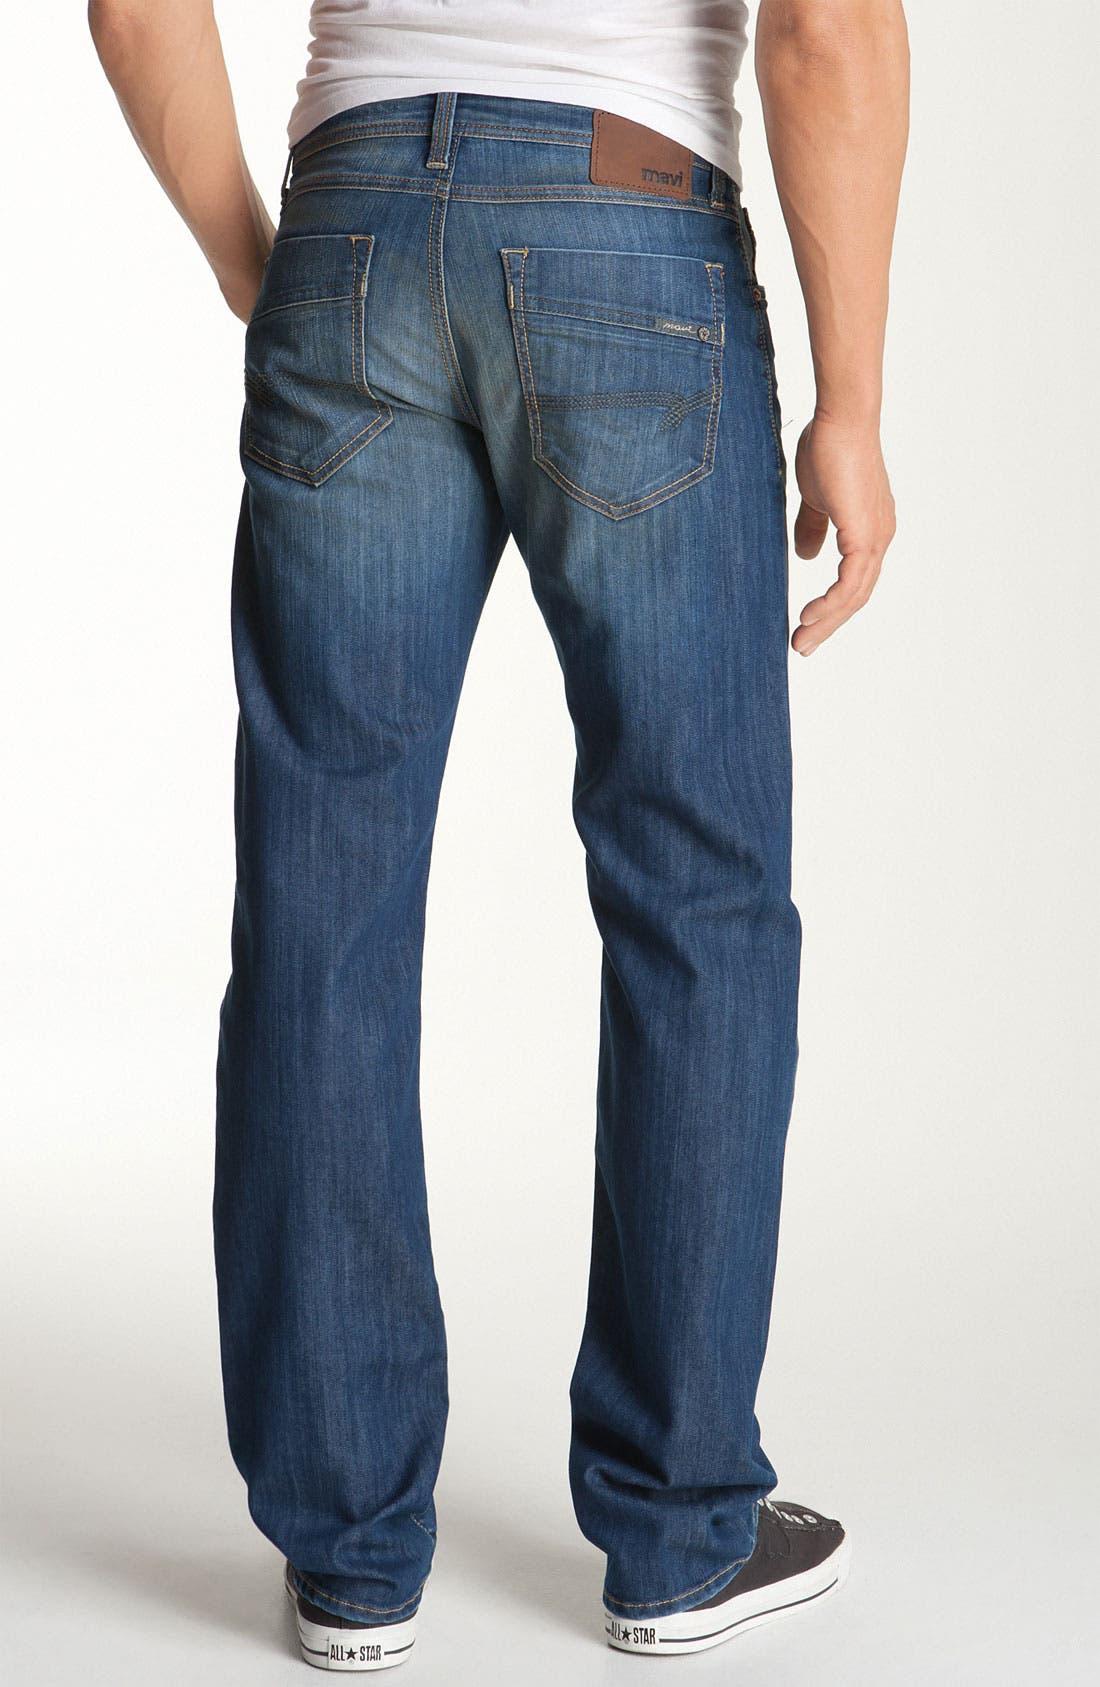 Alternate Image 1 Selected - Mavi Jeans 'Zach' Straight Leg Jeans (Hazy Maui)